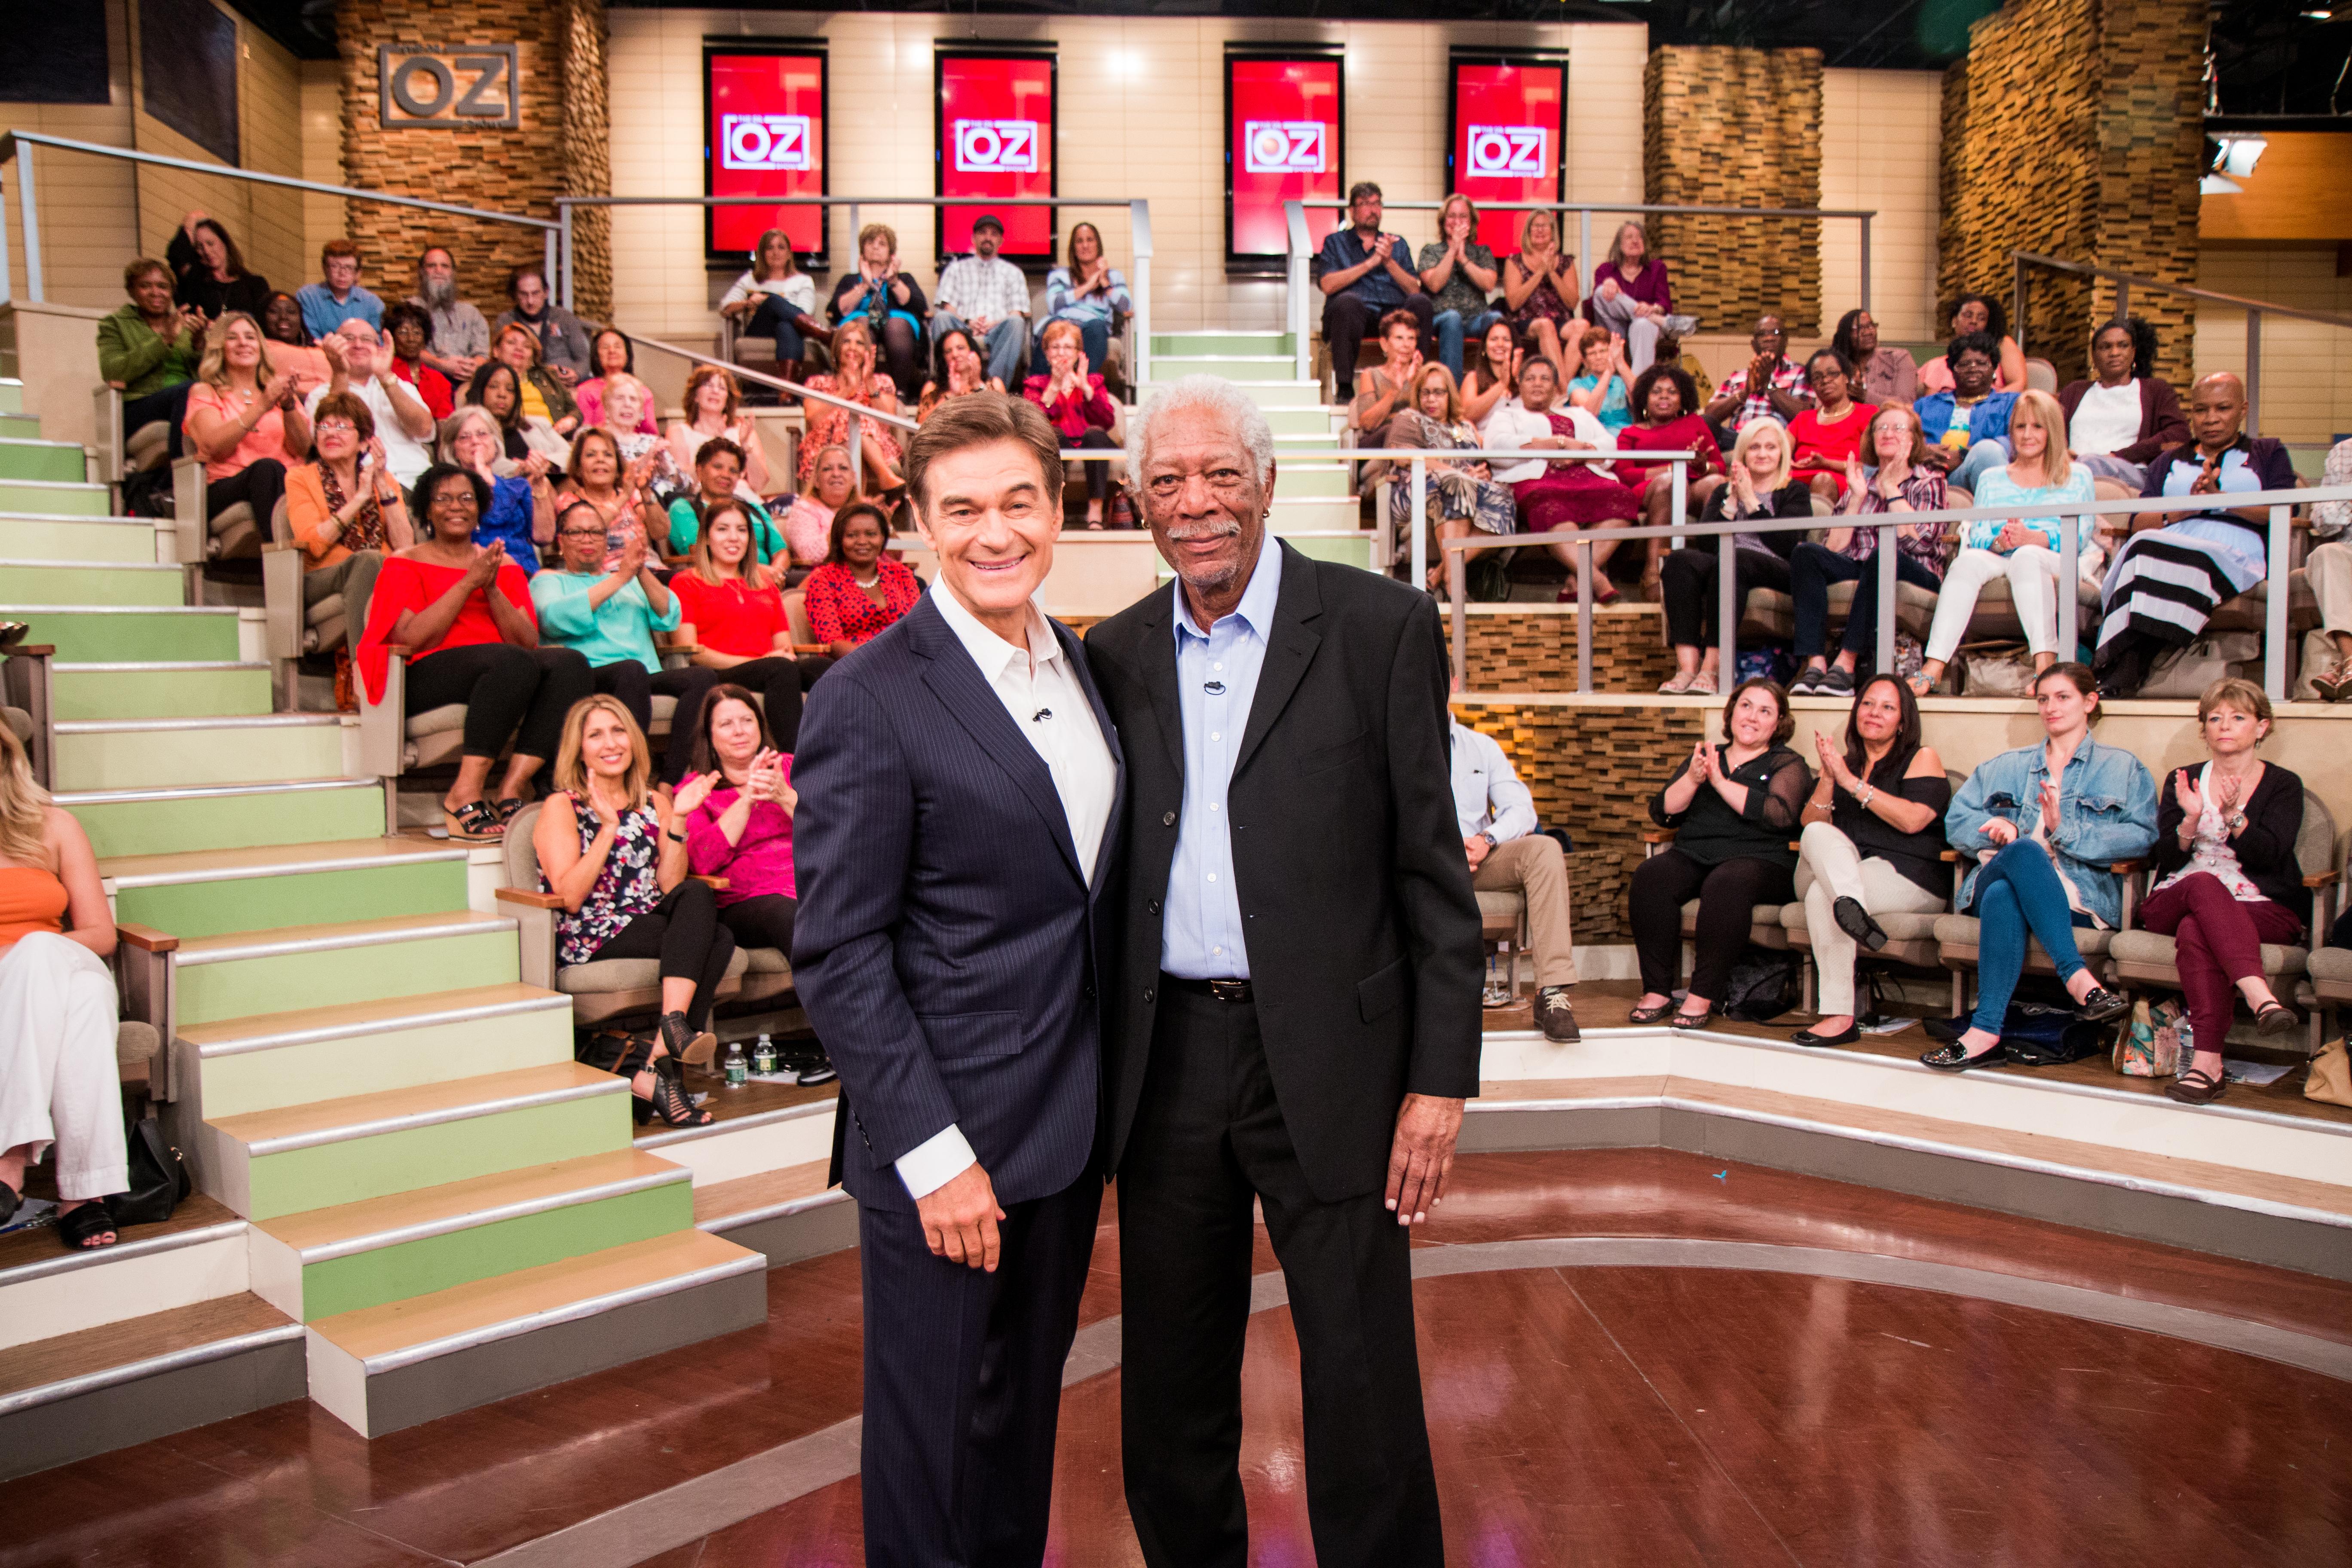 Dr. Oz and Morgan Freeman